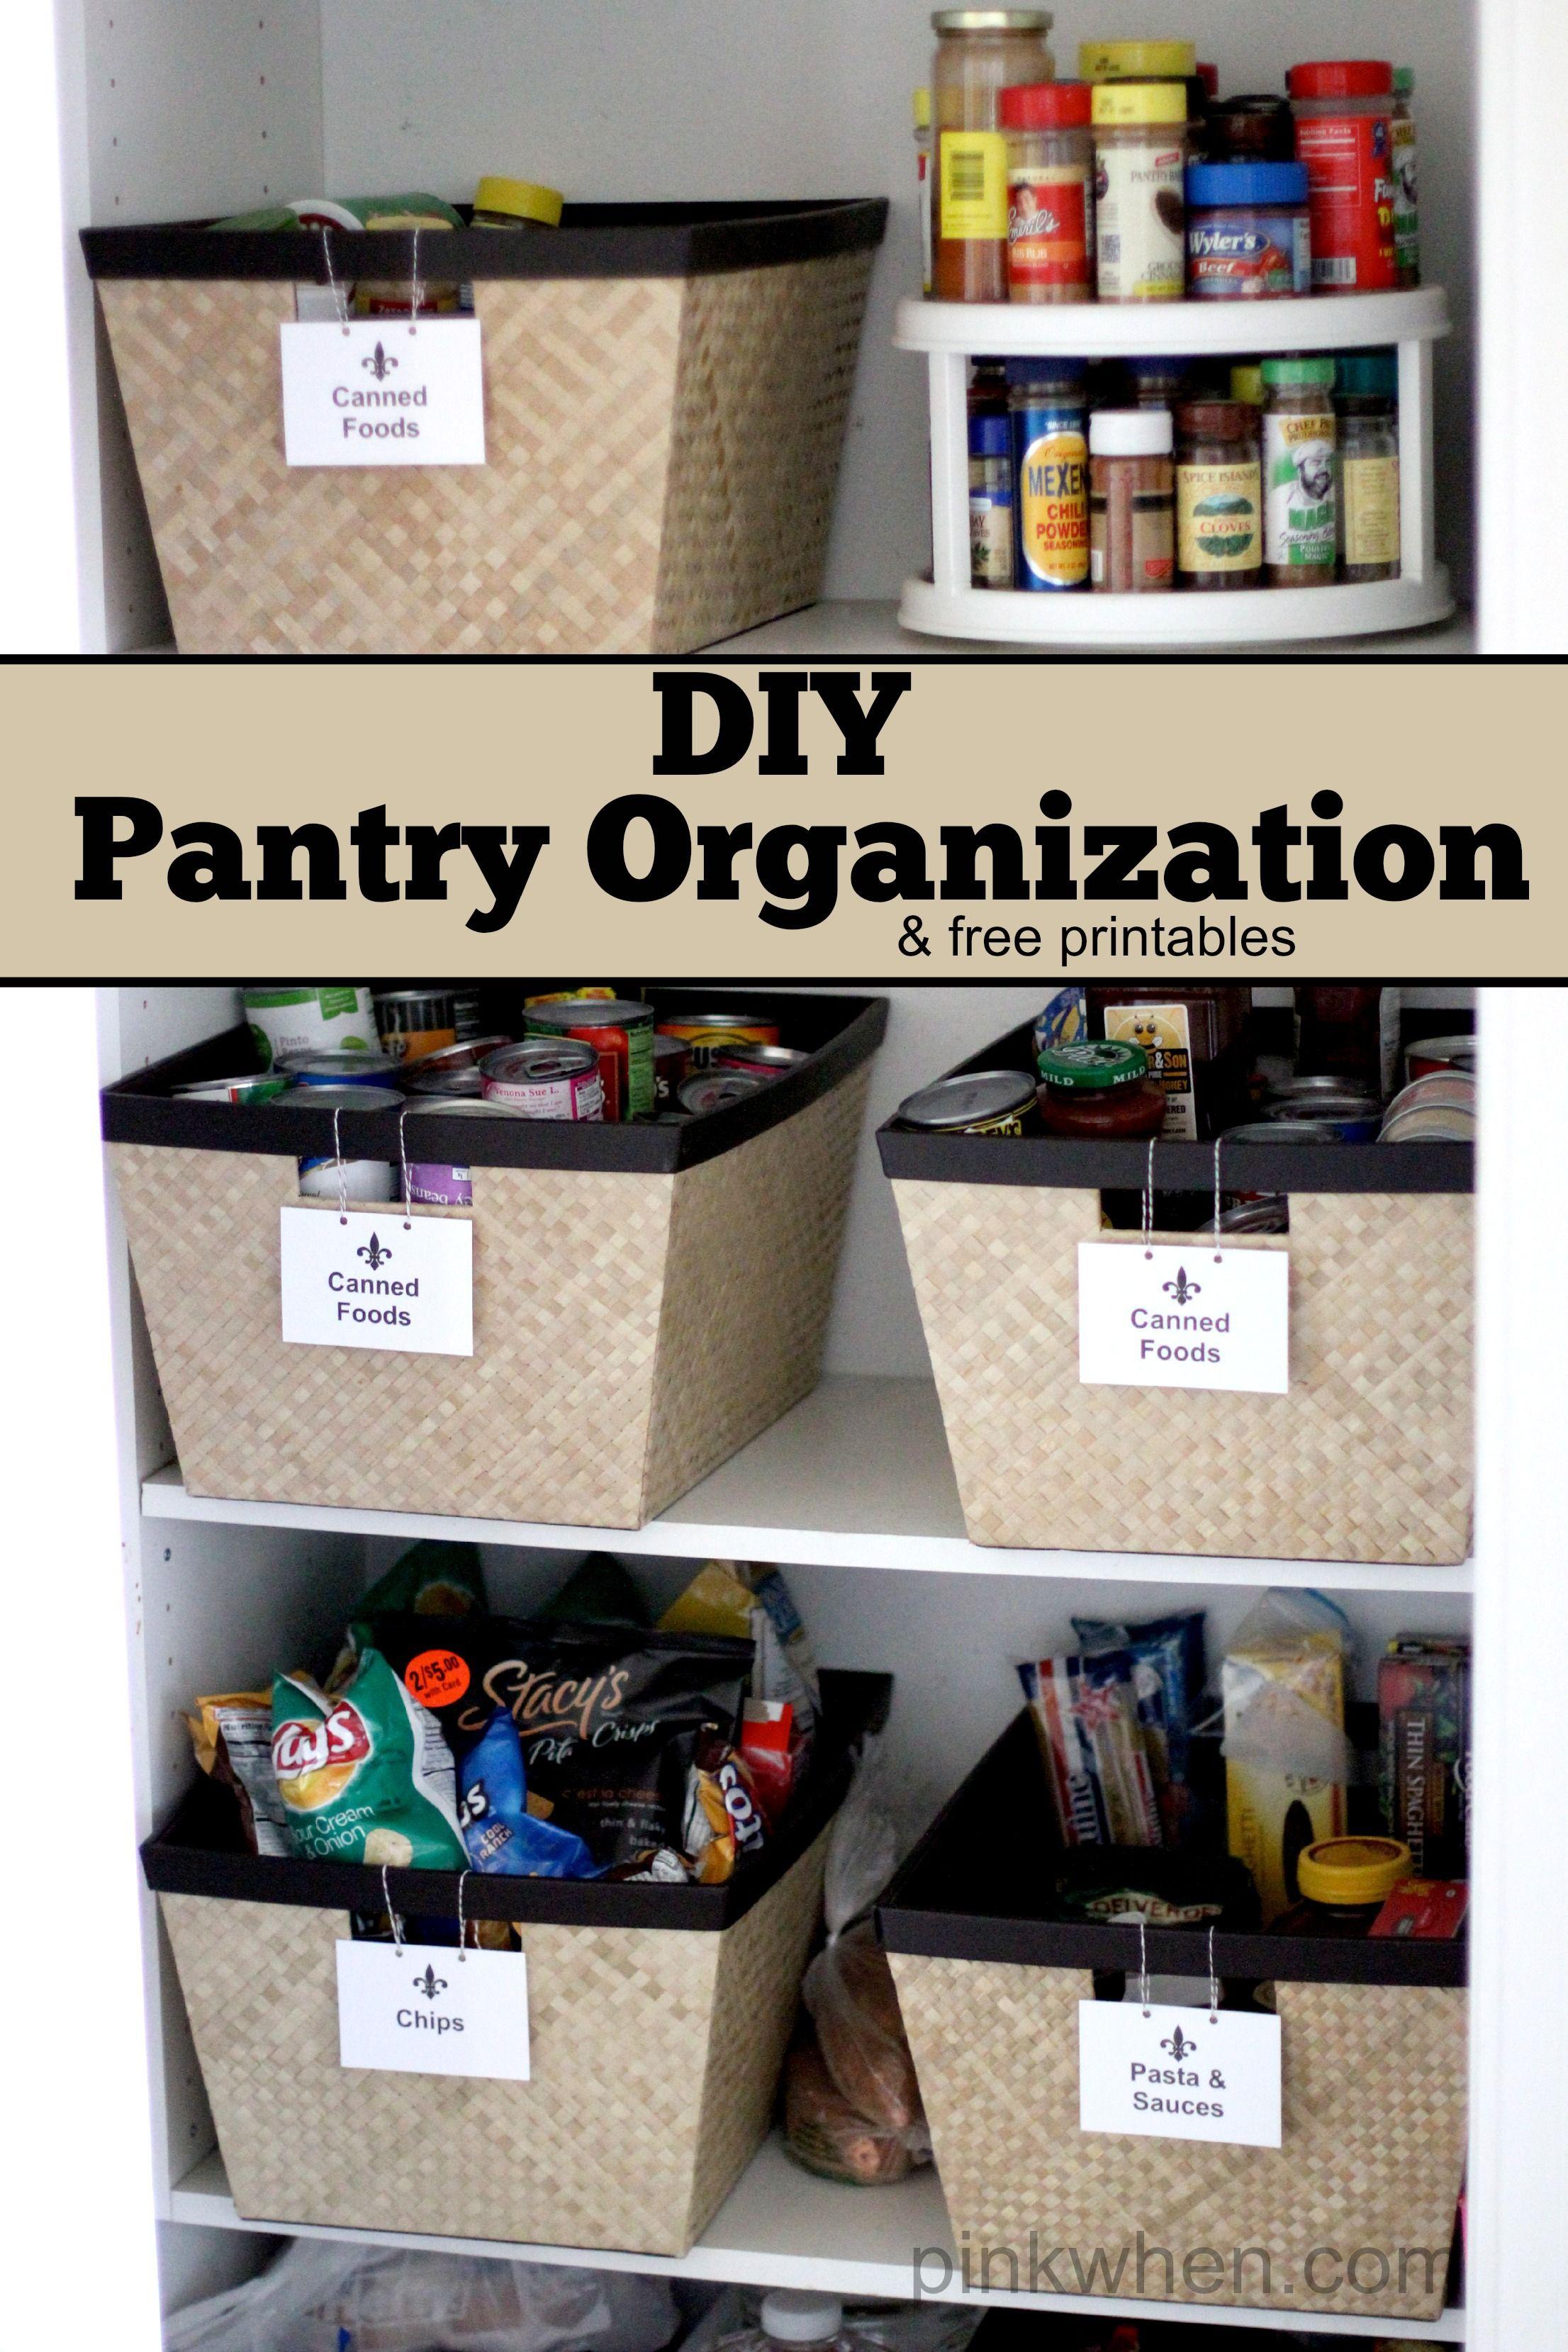 Diy pantry organization project free printable labels pantry